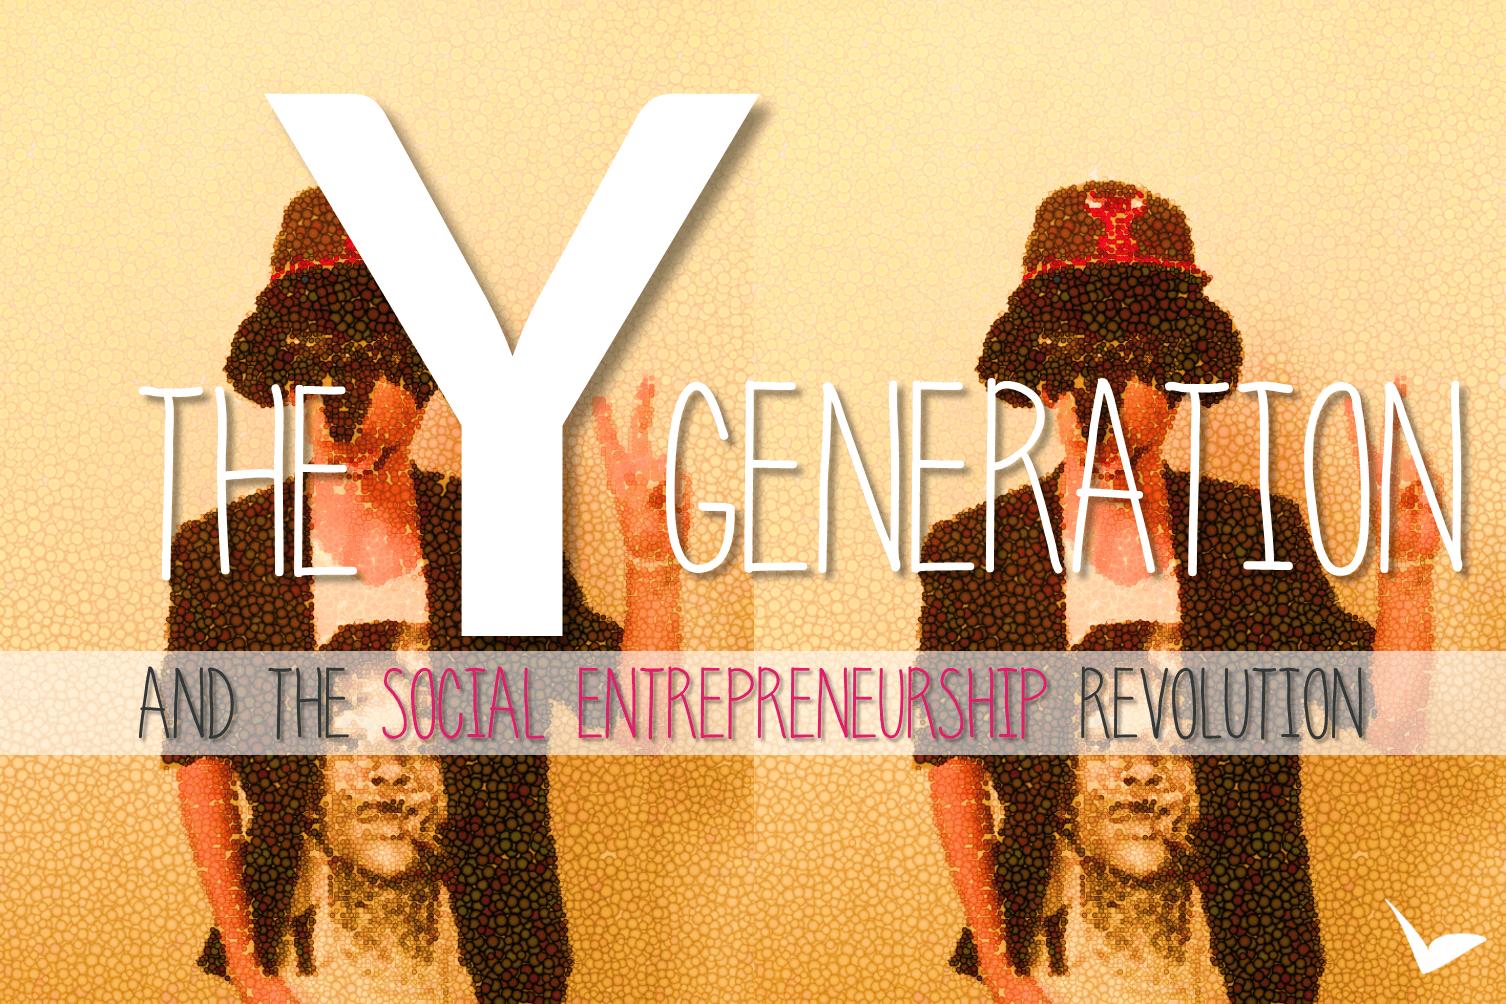 The Y generation & the social entrepreneurship revolution